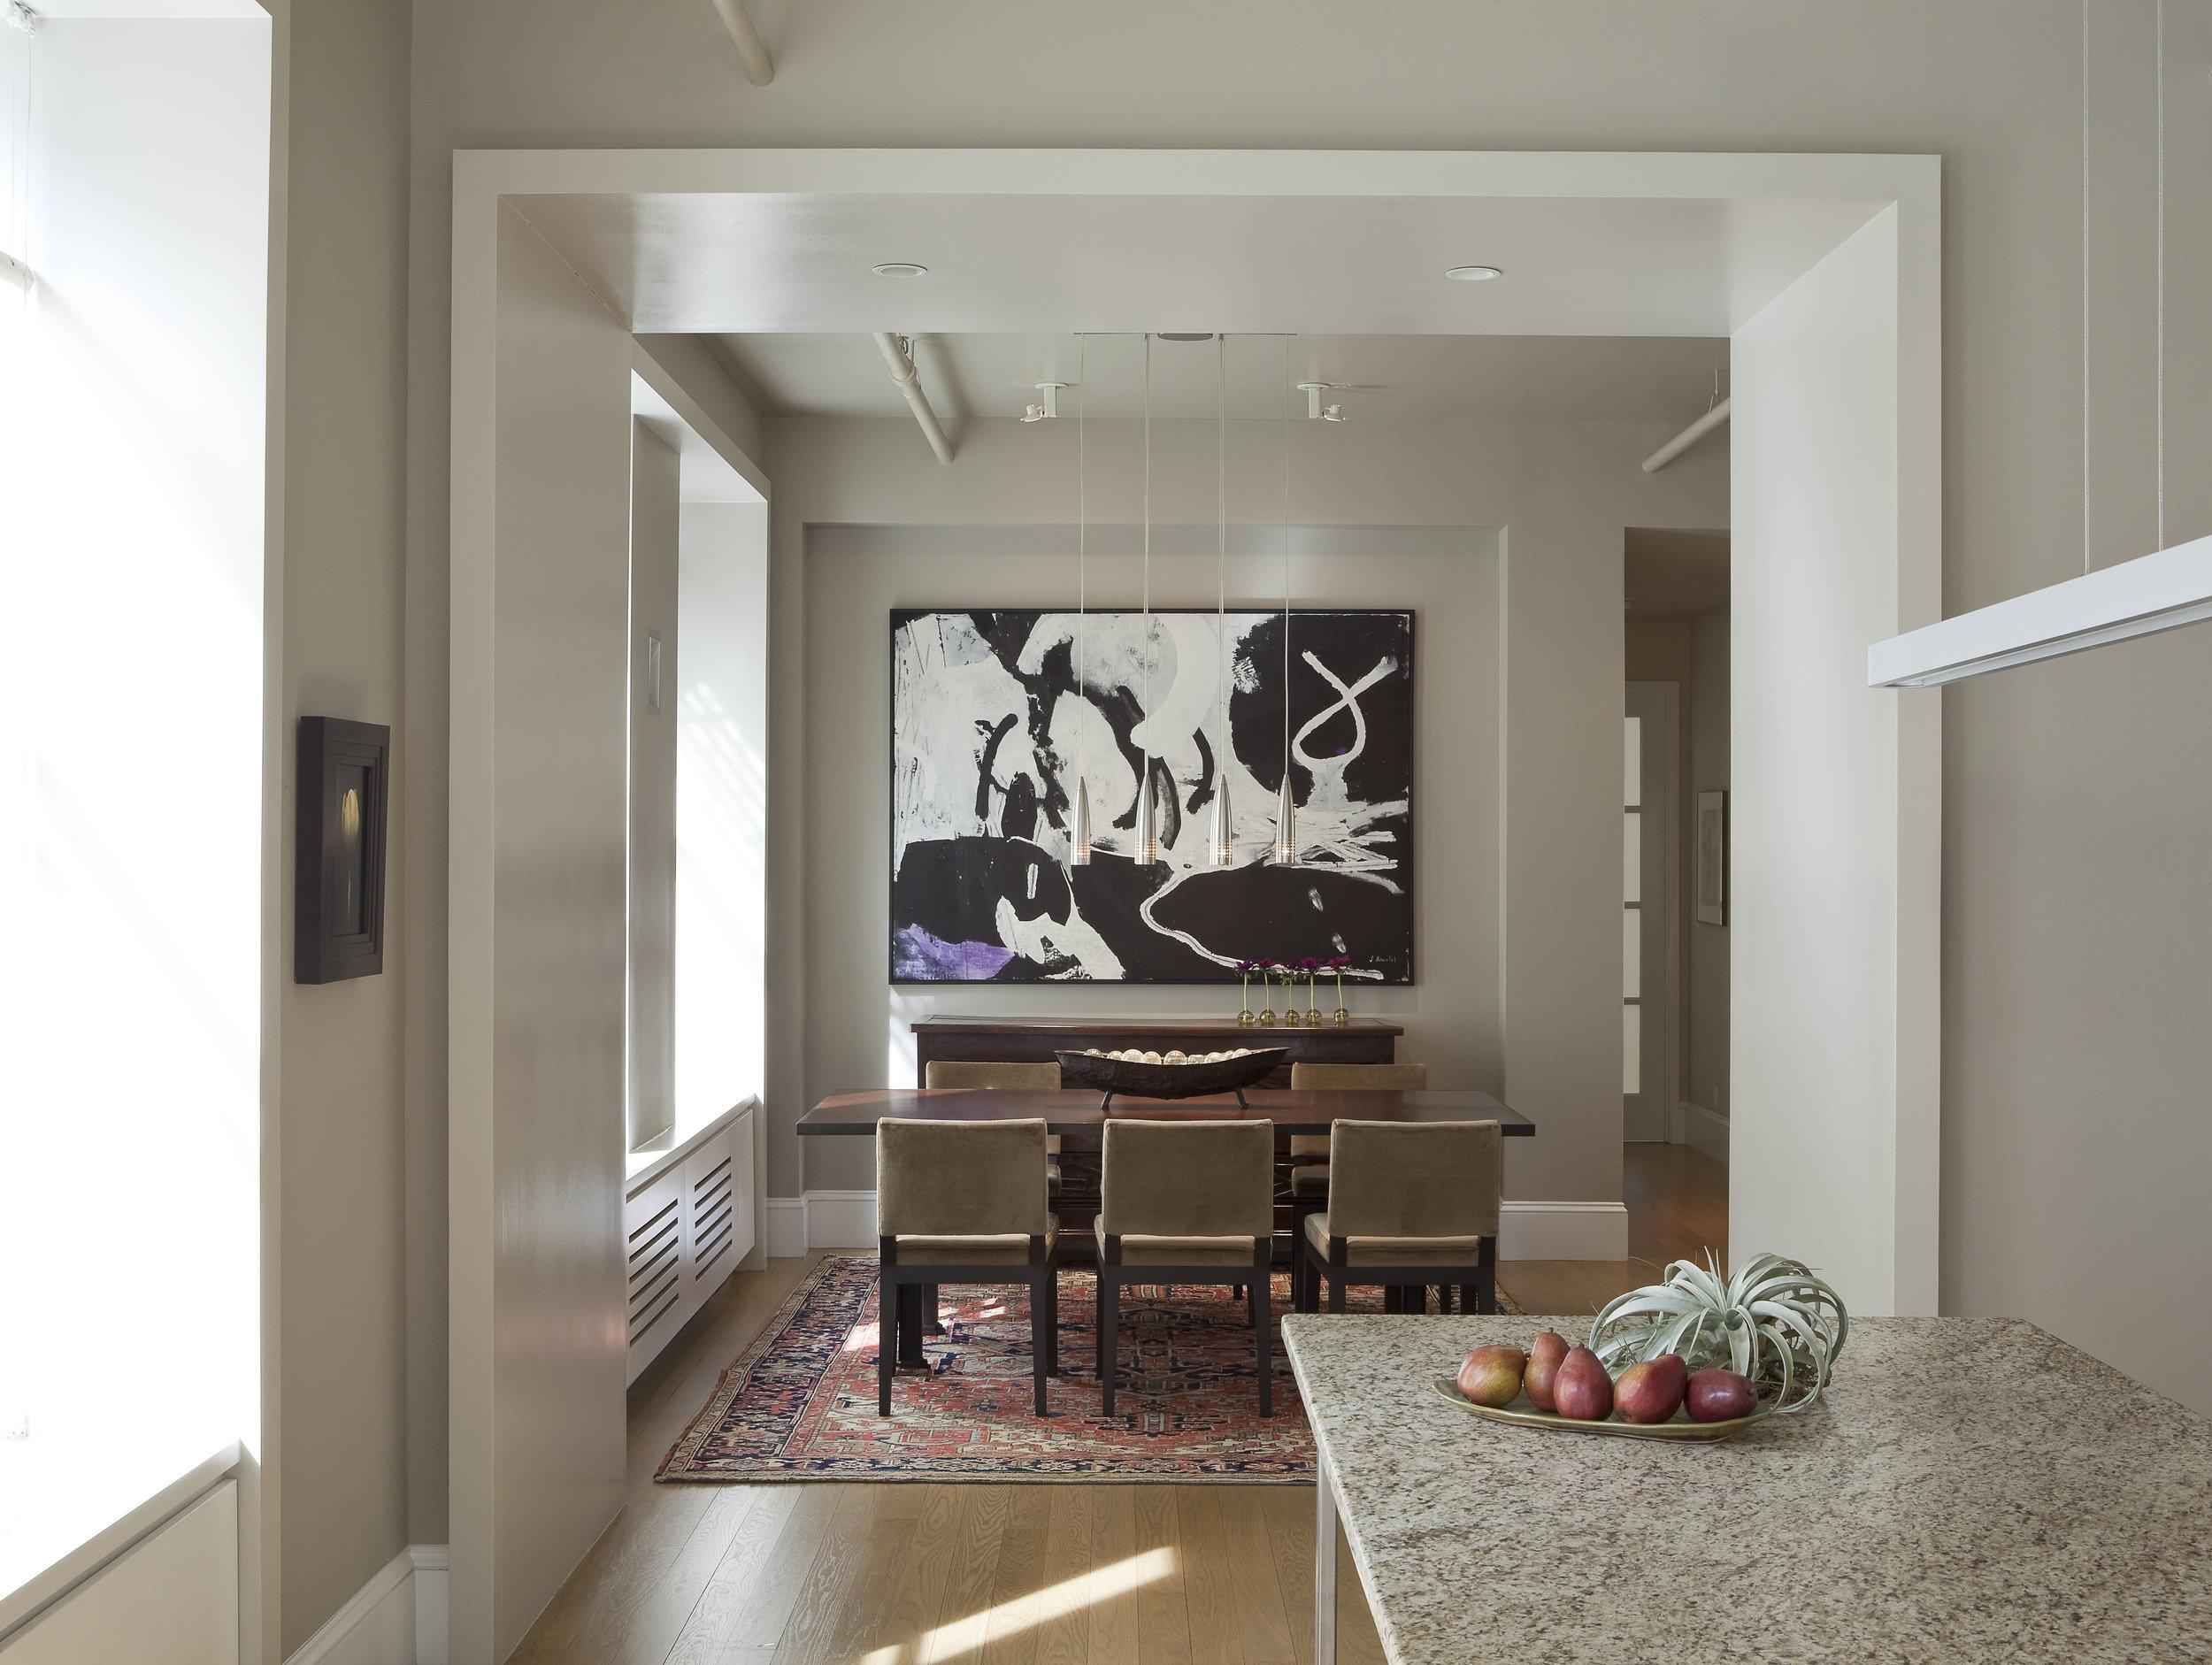 Greenwood Design © Peter Margonelli